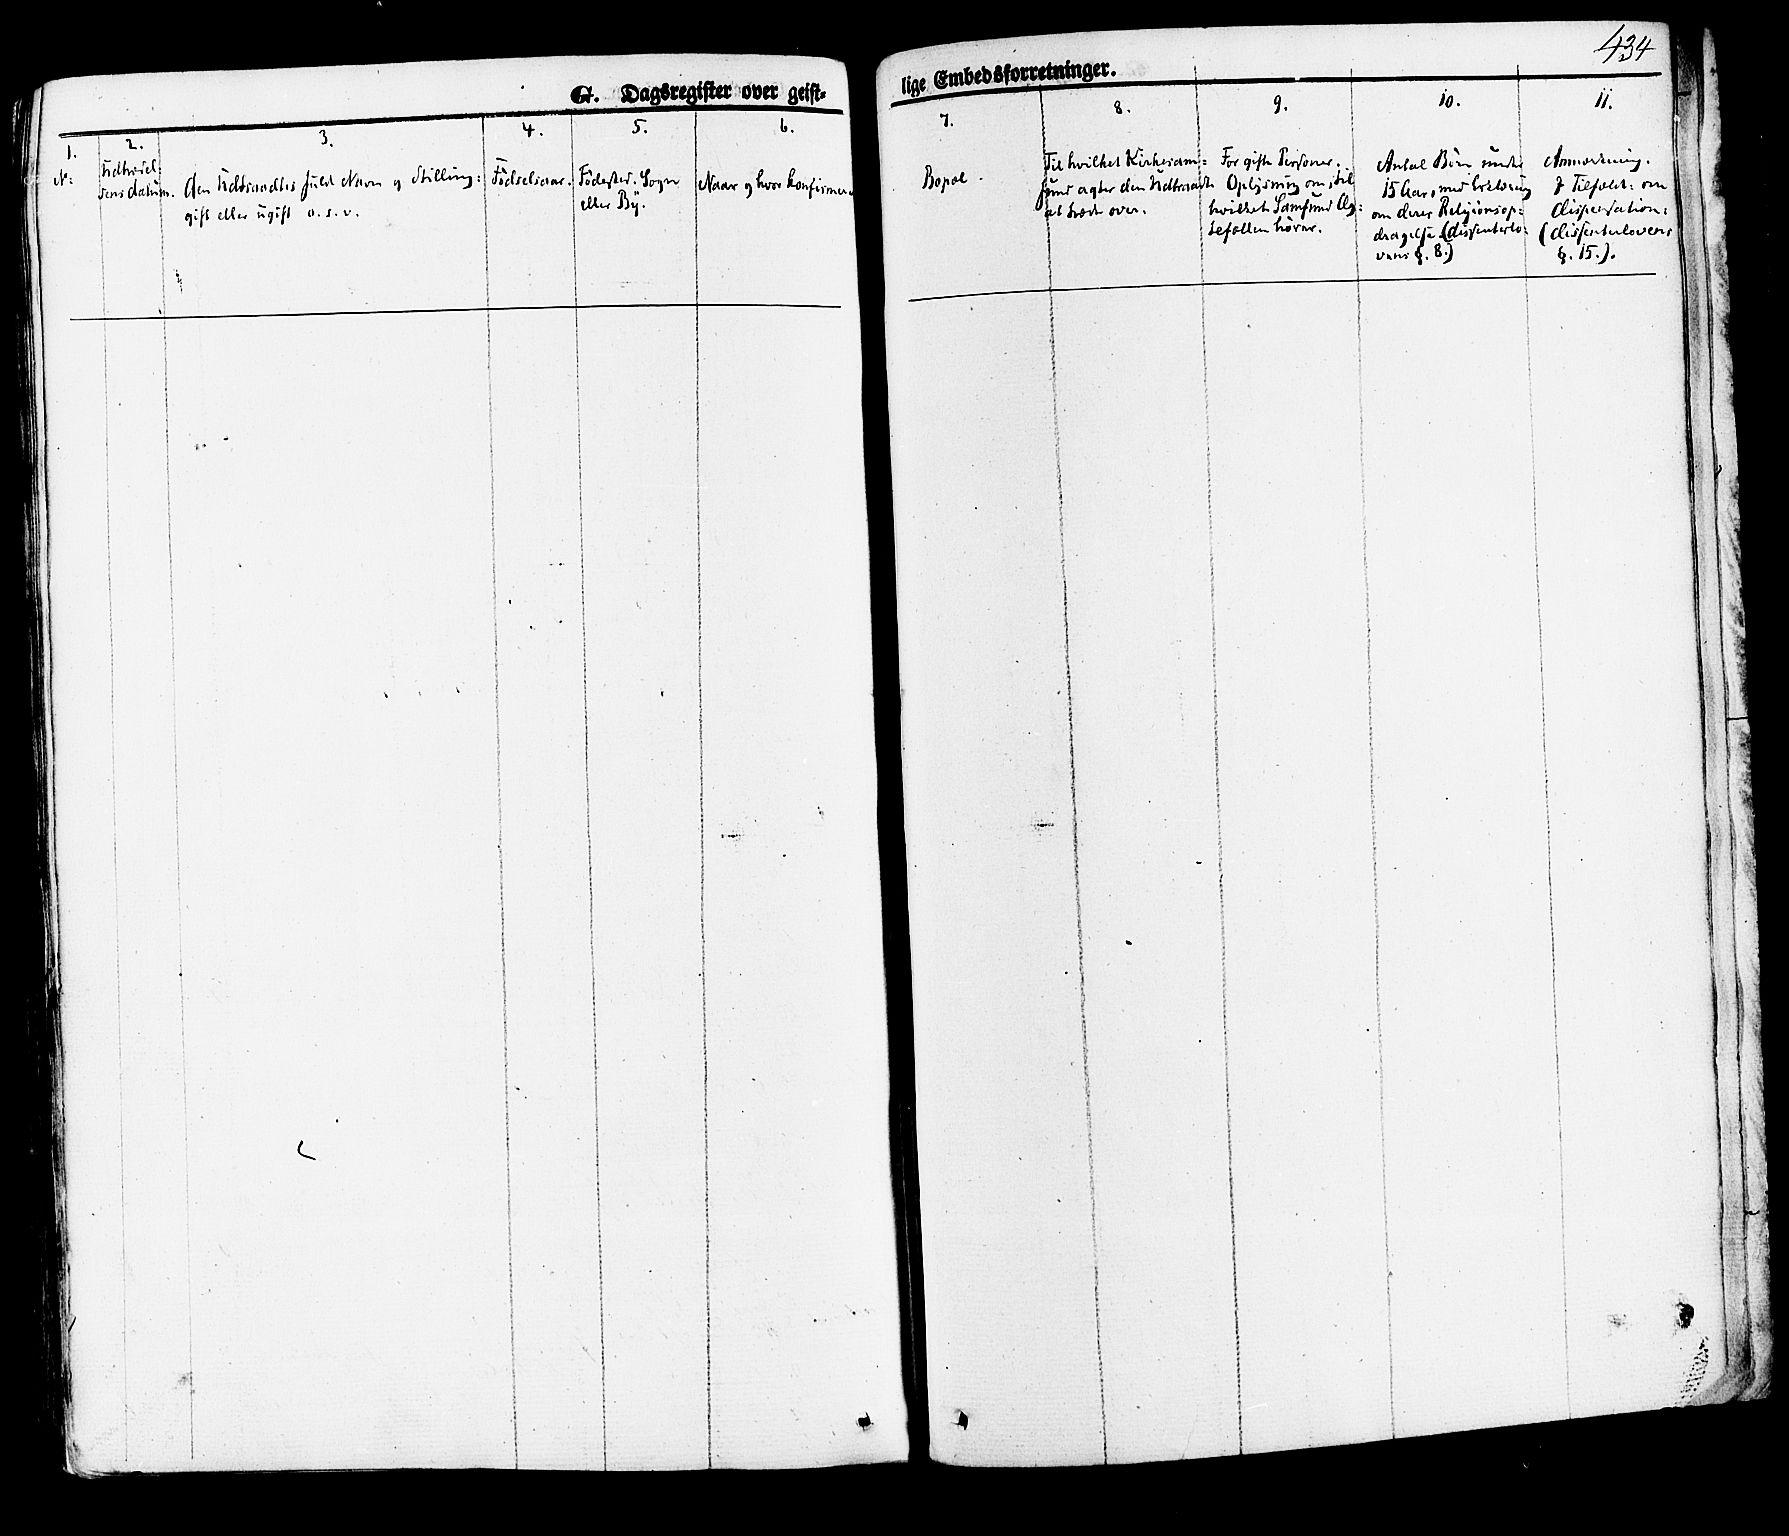 SAKO, Hjartdal kirkebøker, F/Fa/L0009: Ministerialbok nr. I 9, 1860-1879, s. 434